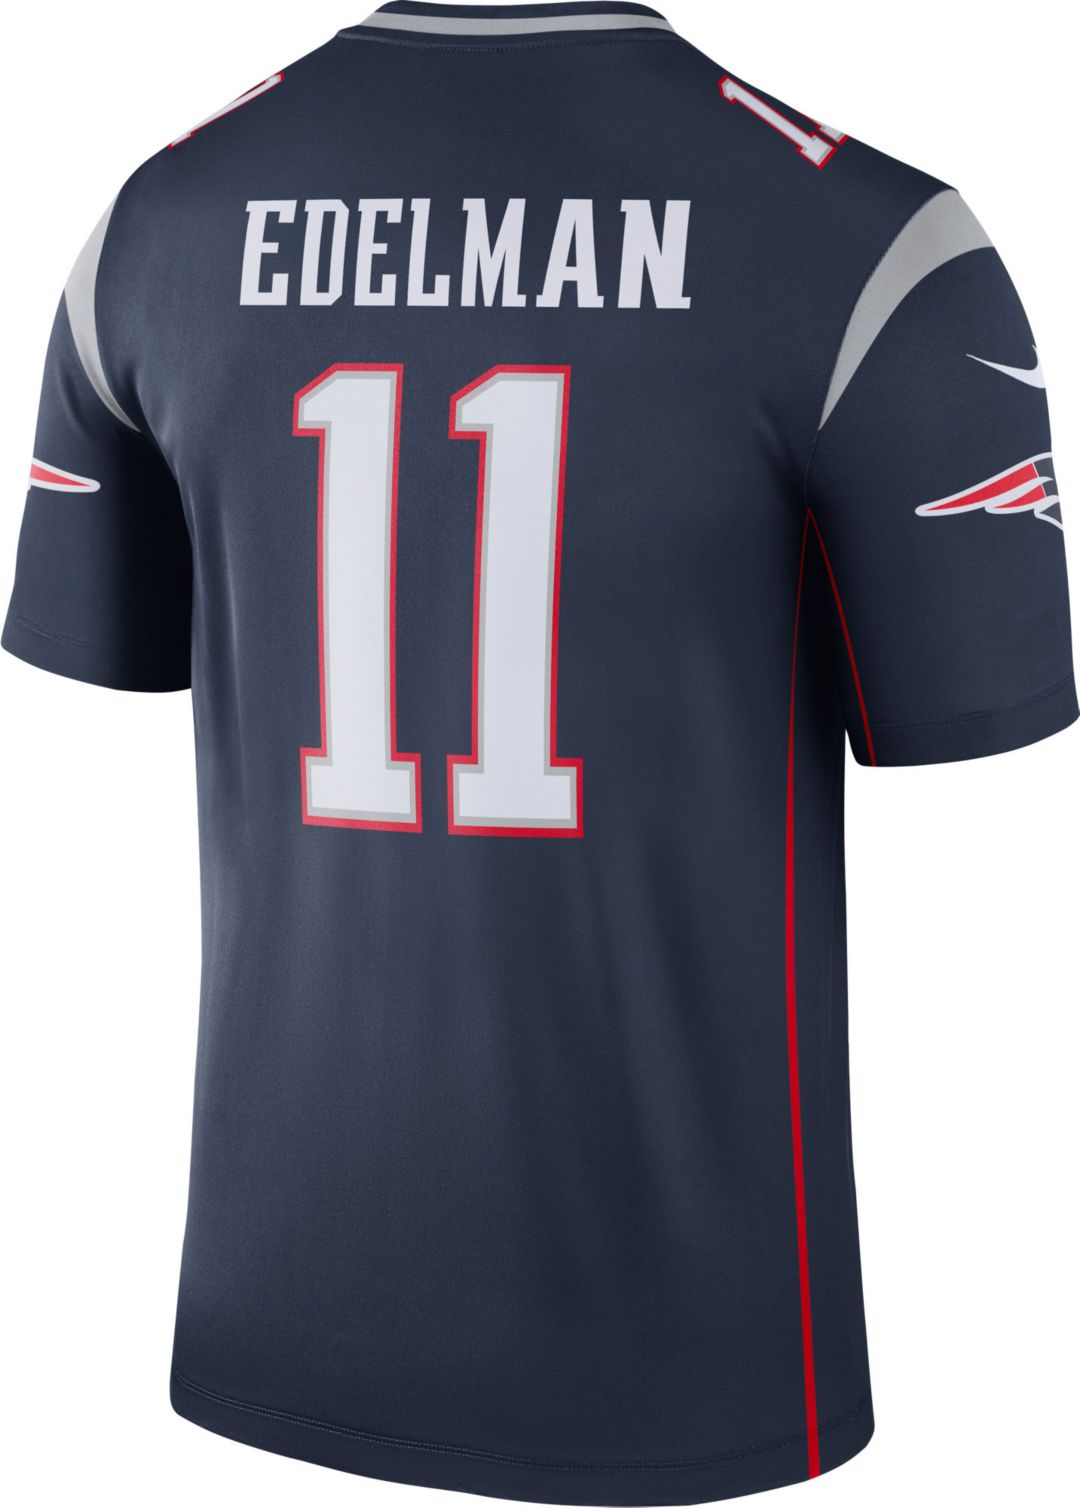 more photos b9857 93848 Nike Men's Home Legend Jersey New England Patriots Julian Edelman #11